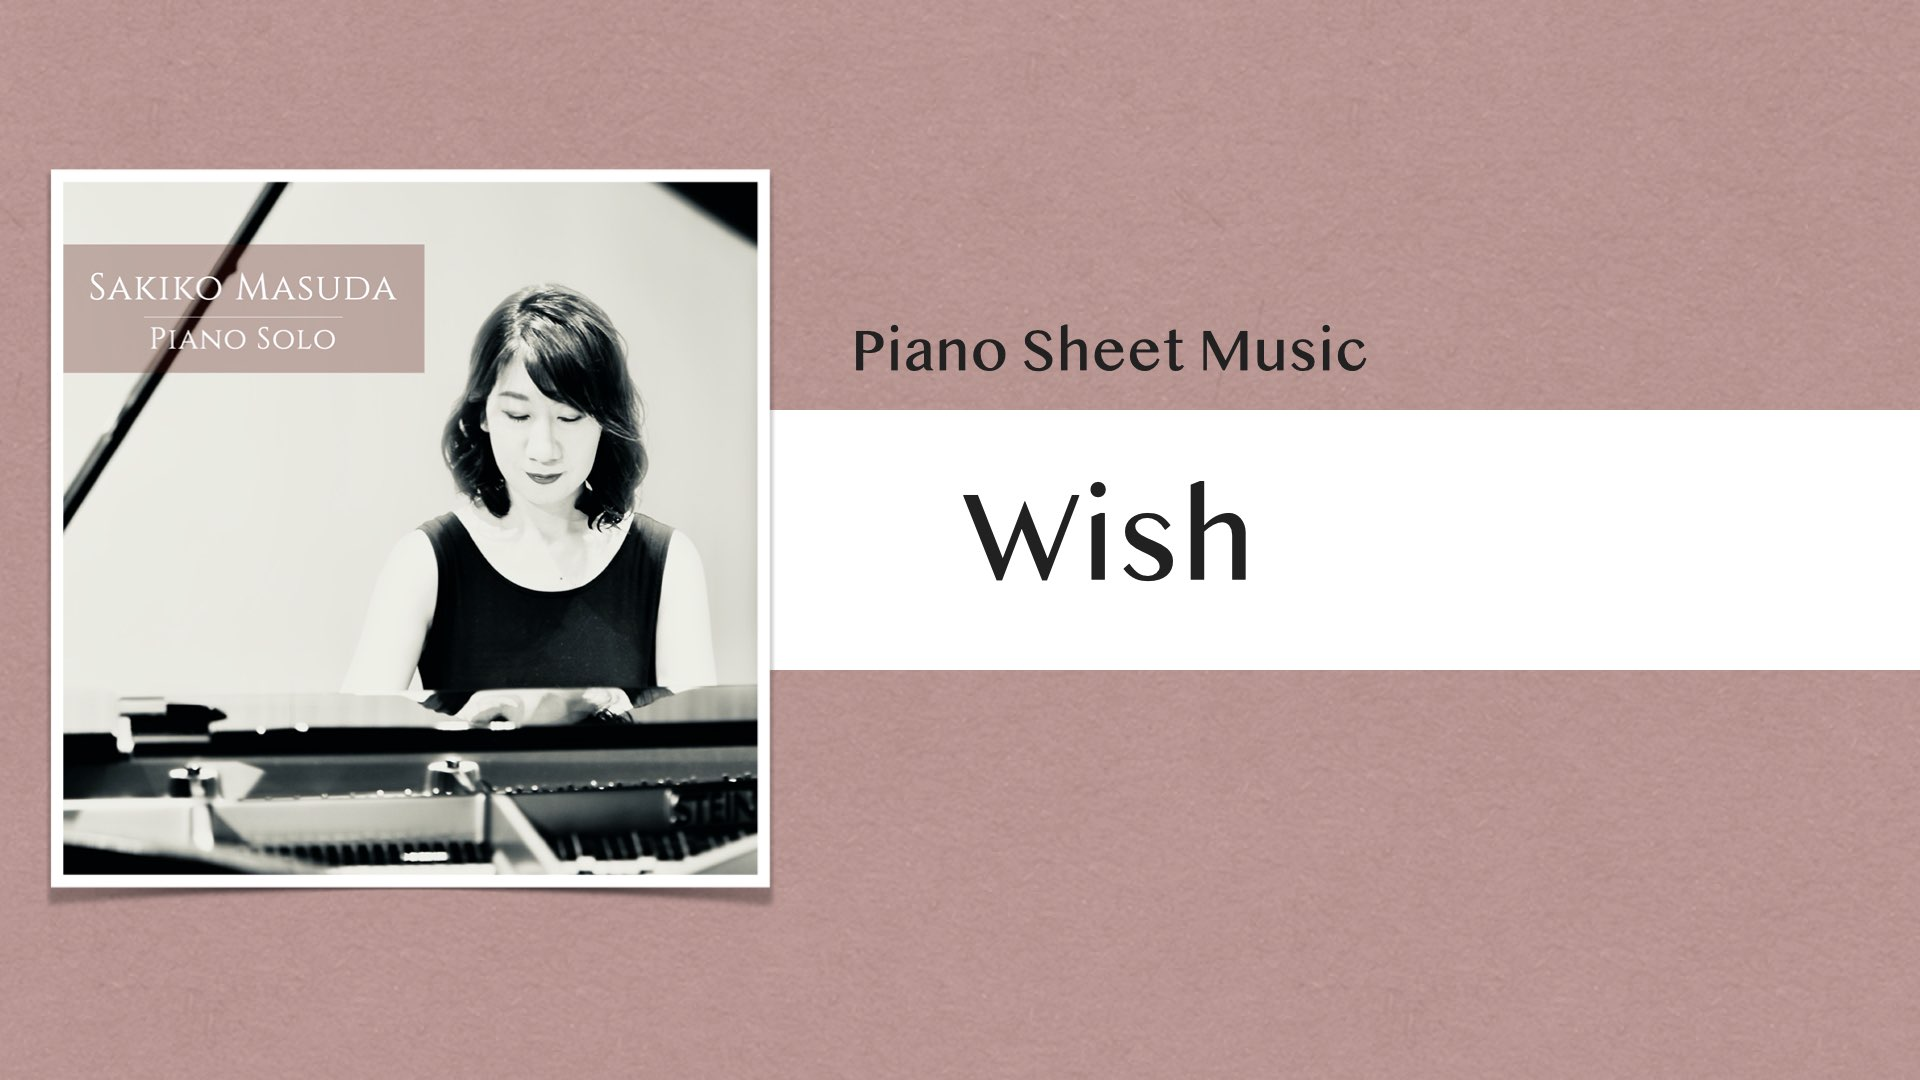 Wish【ピアノ楽譜】